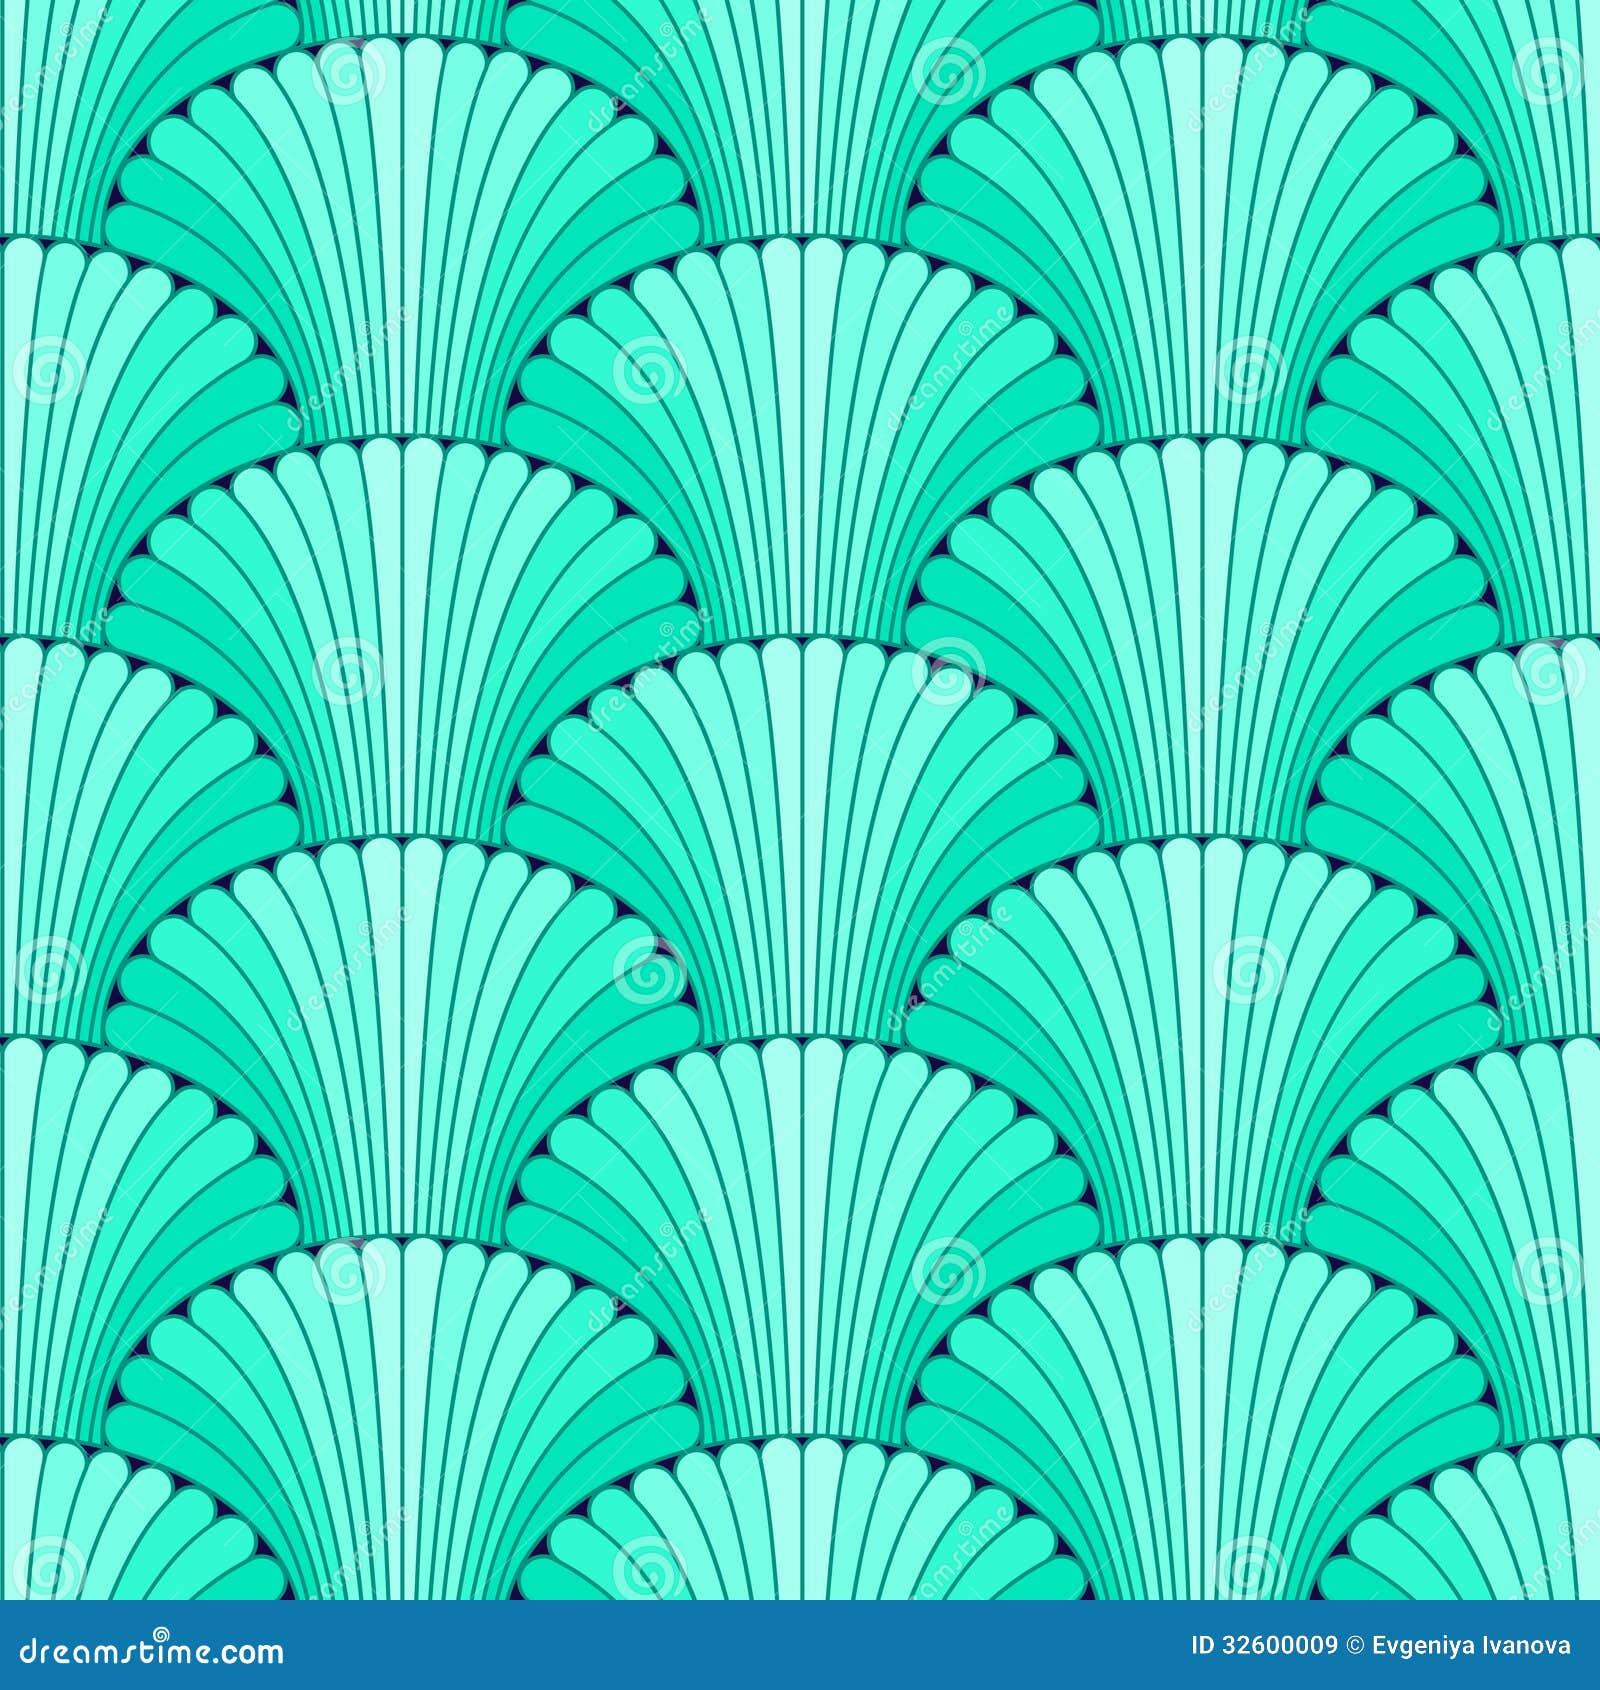 Nieuwe Kleurboeken 12 also Art Nouveaudeco in addition 99201 Free Art Deco Vector Background further Htc Desire 10 likewise 3554. on art deco patterns